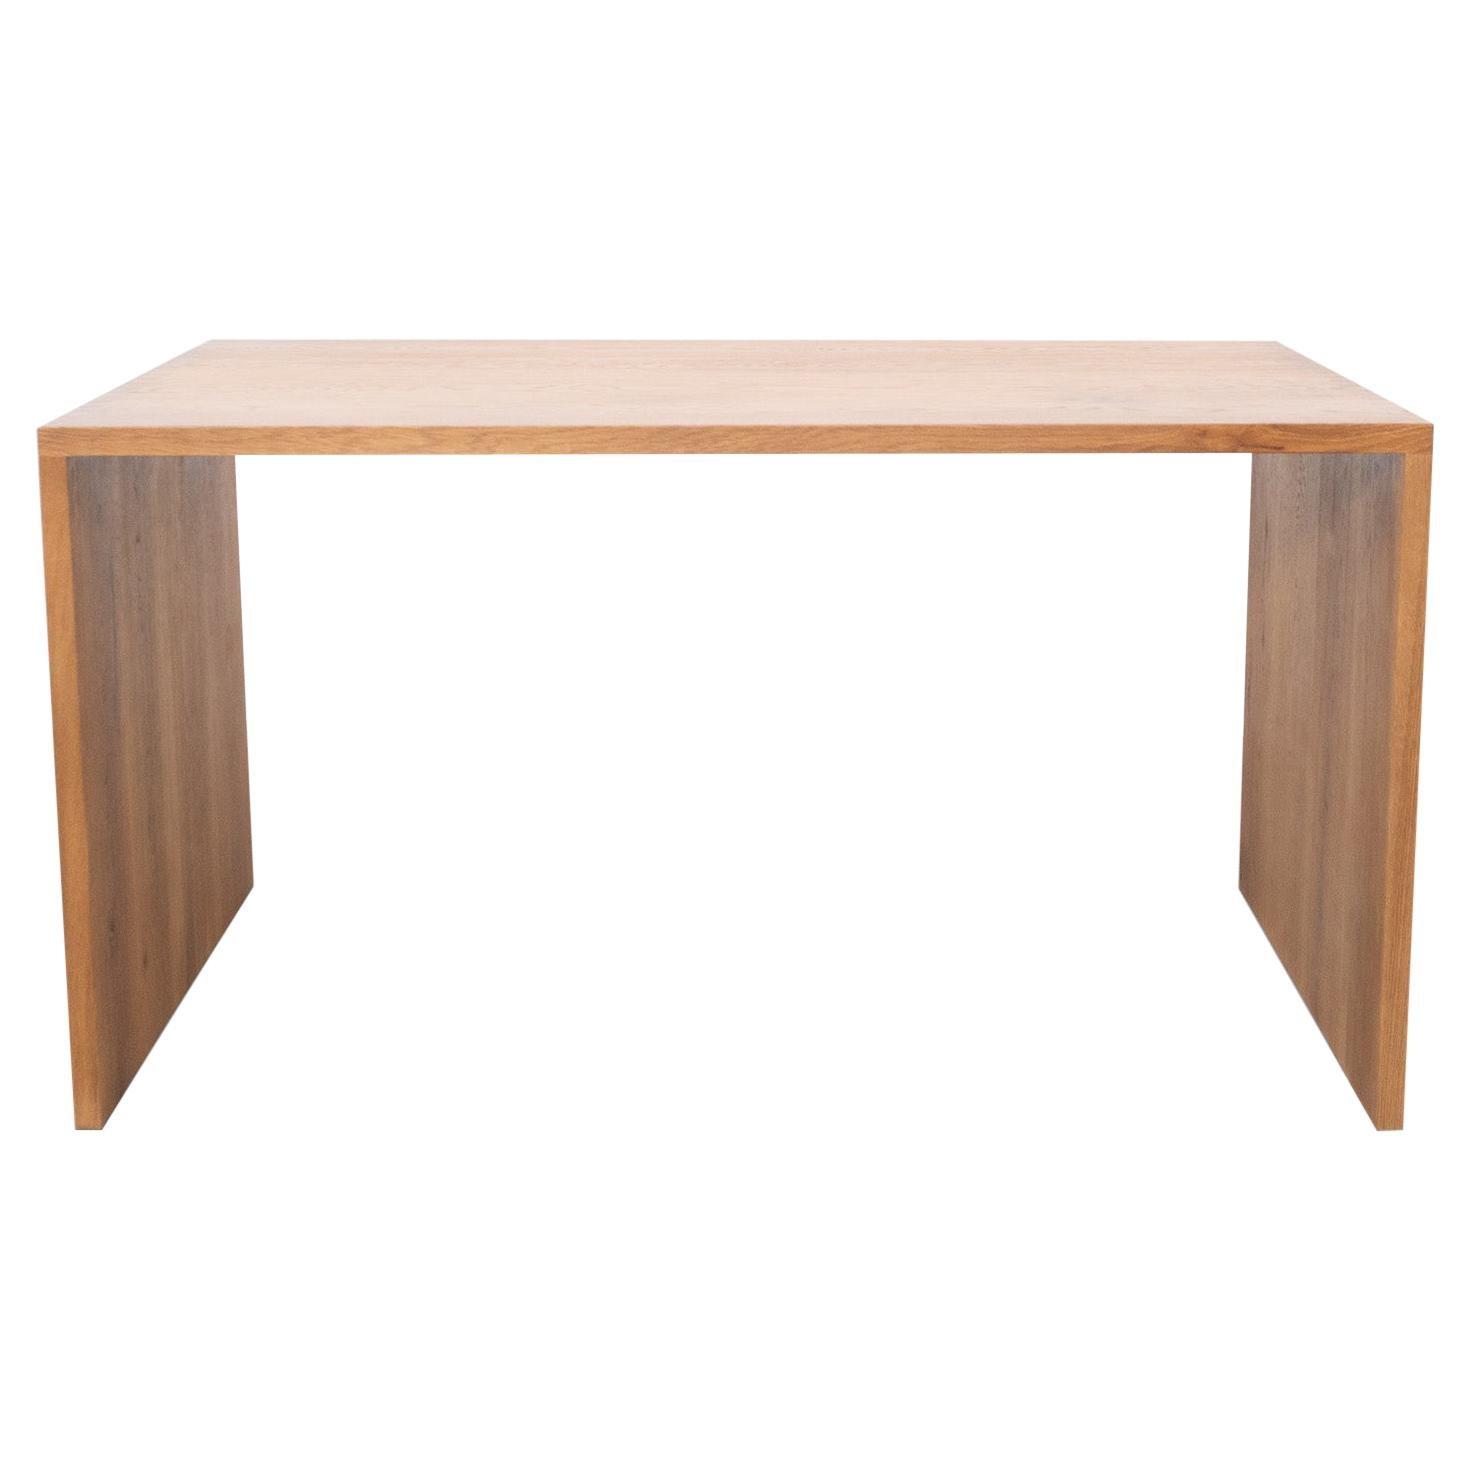 Dada Est. Contemporary Solid Oak Dining Table